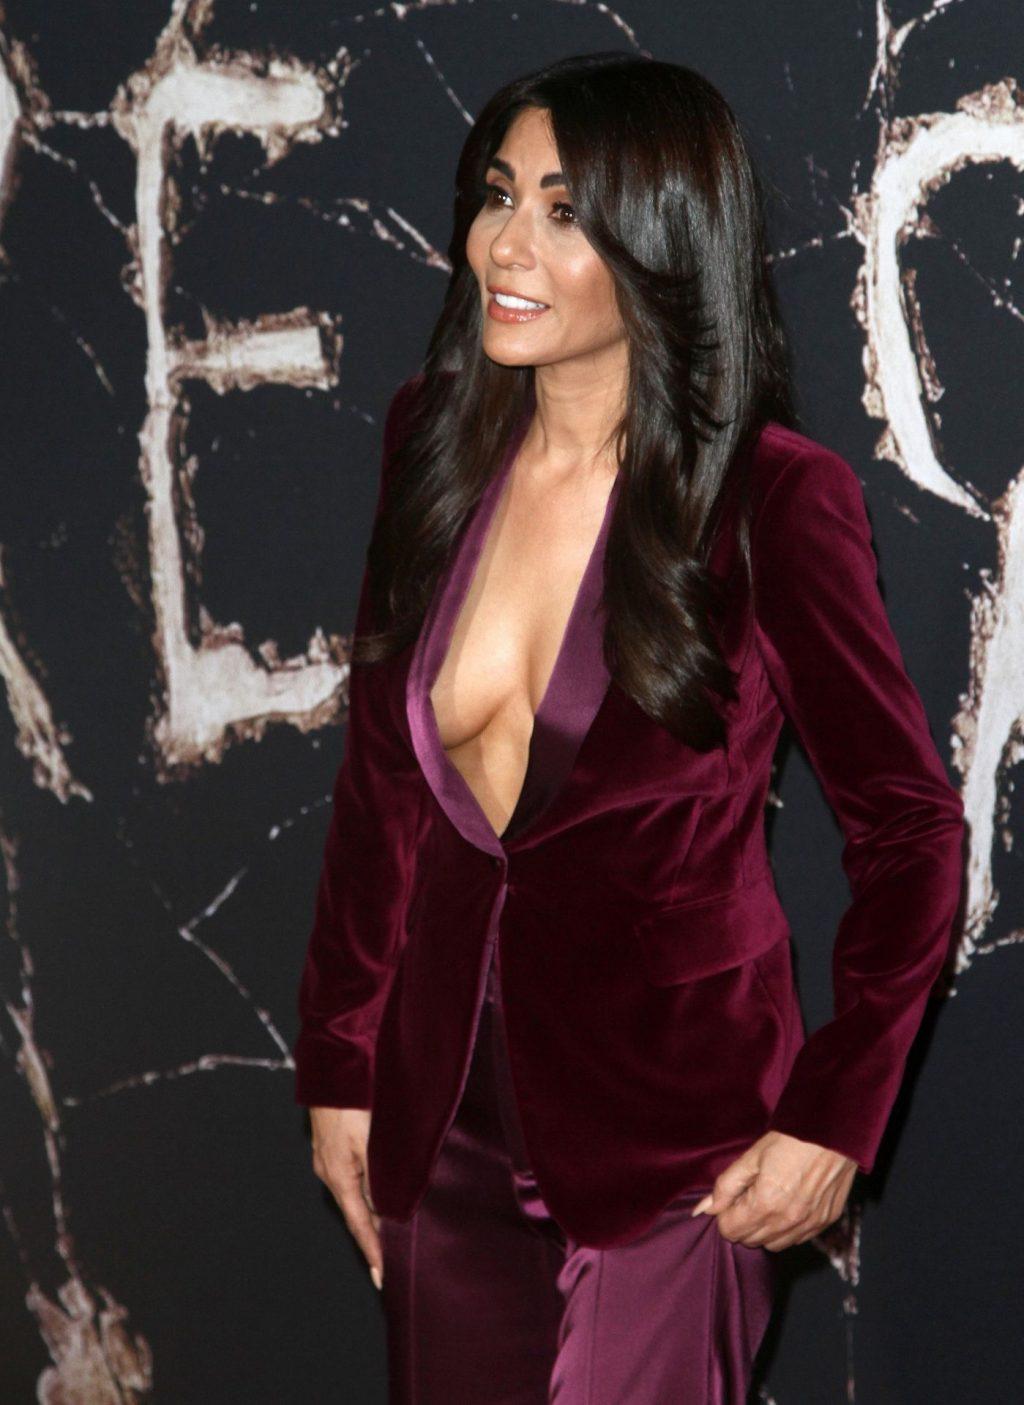 Marisol Nichols Sexy (44 Photos)